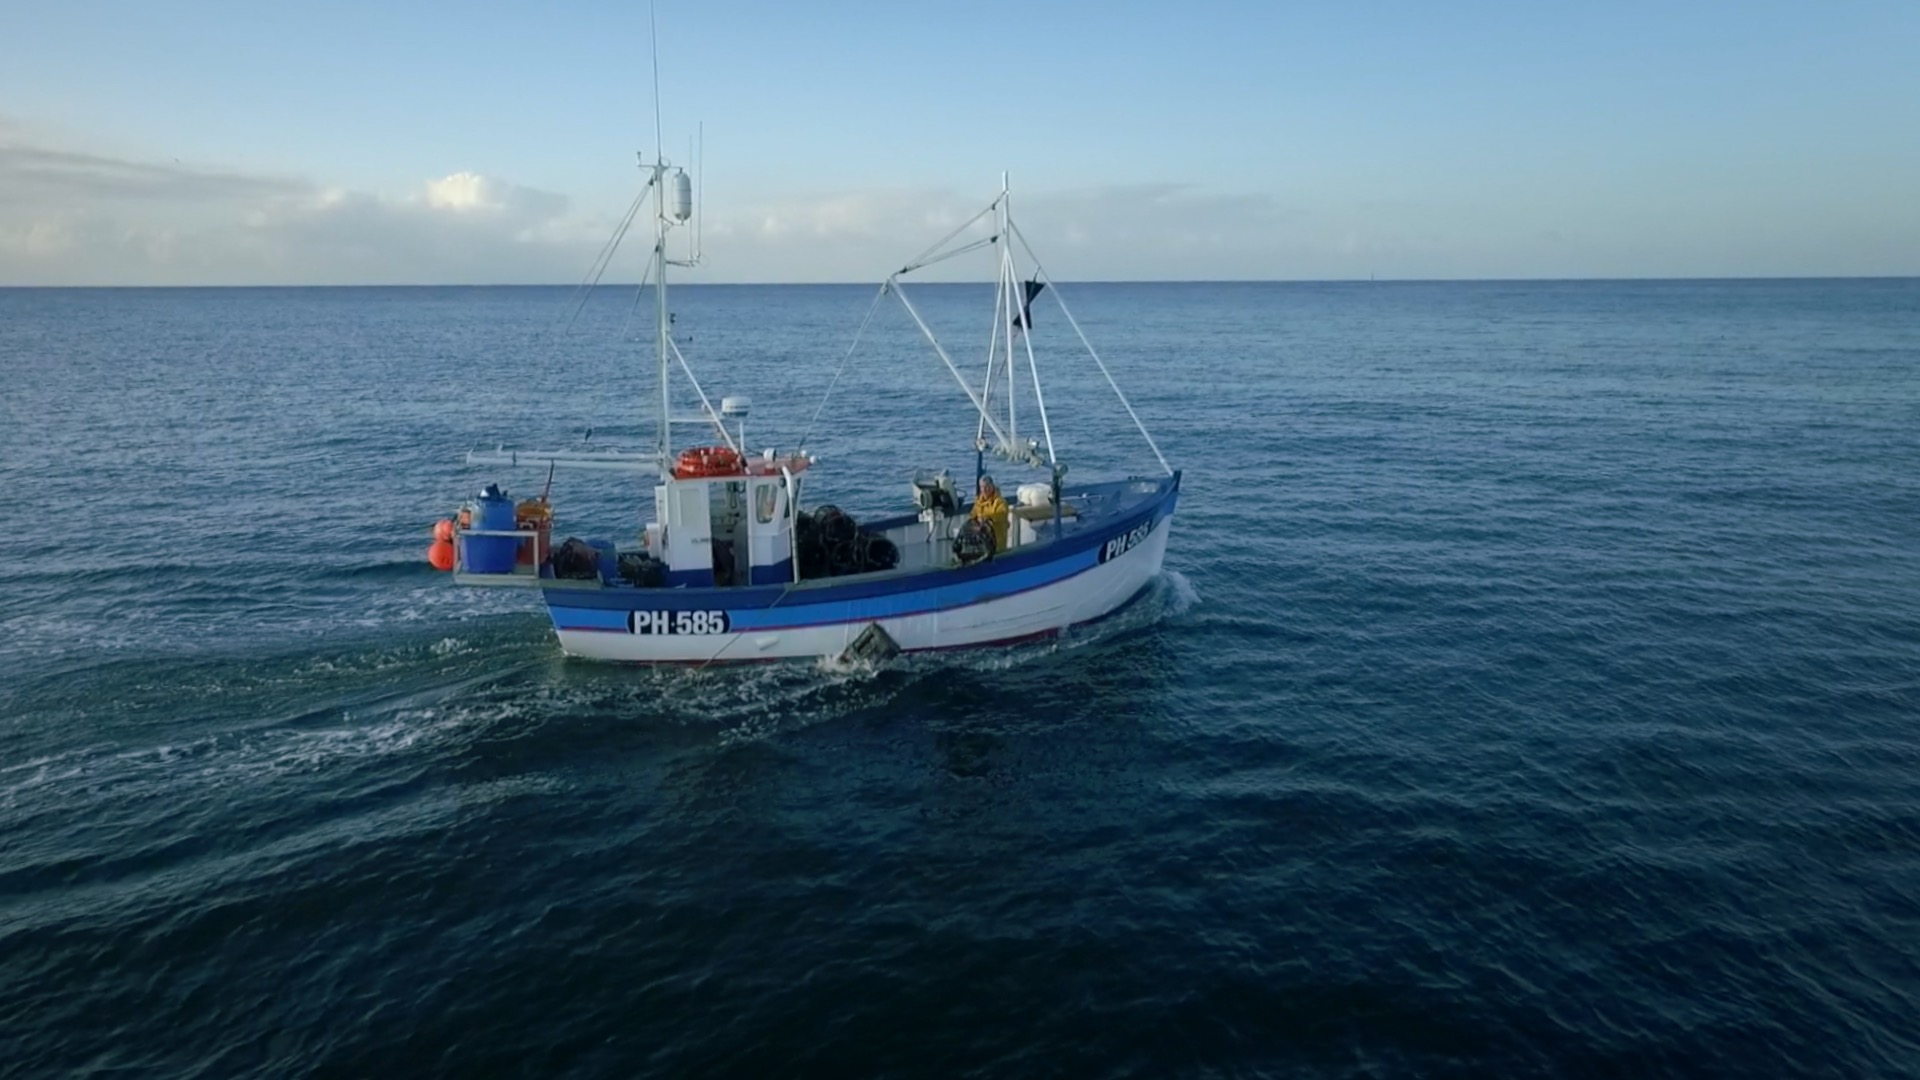 Fisherman_0134_Marker_539.jpg